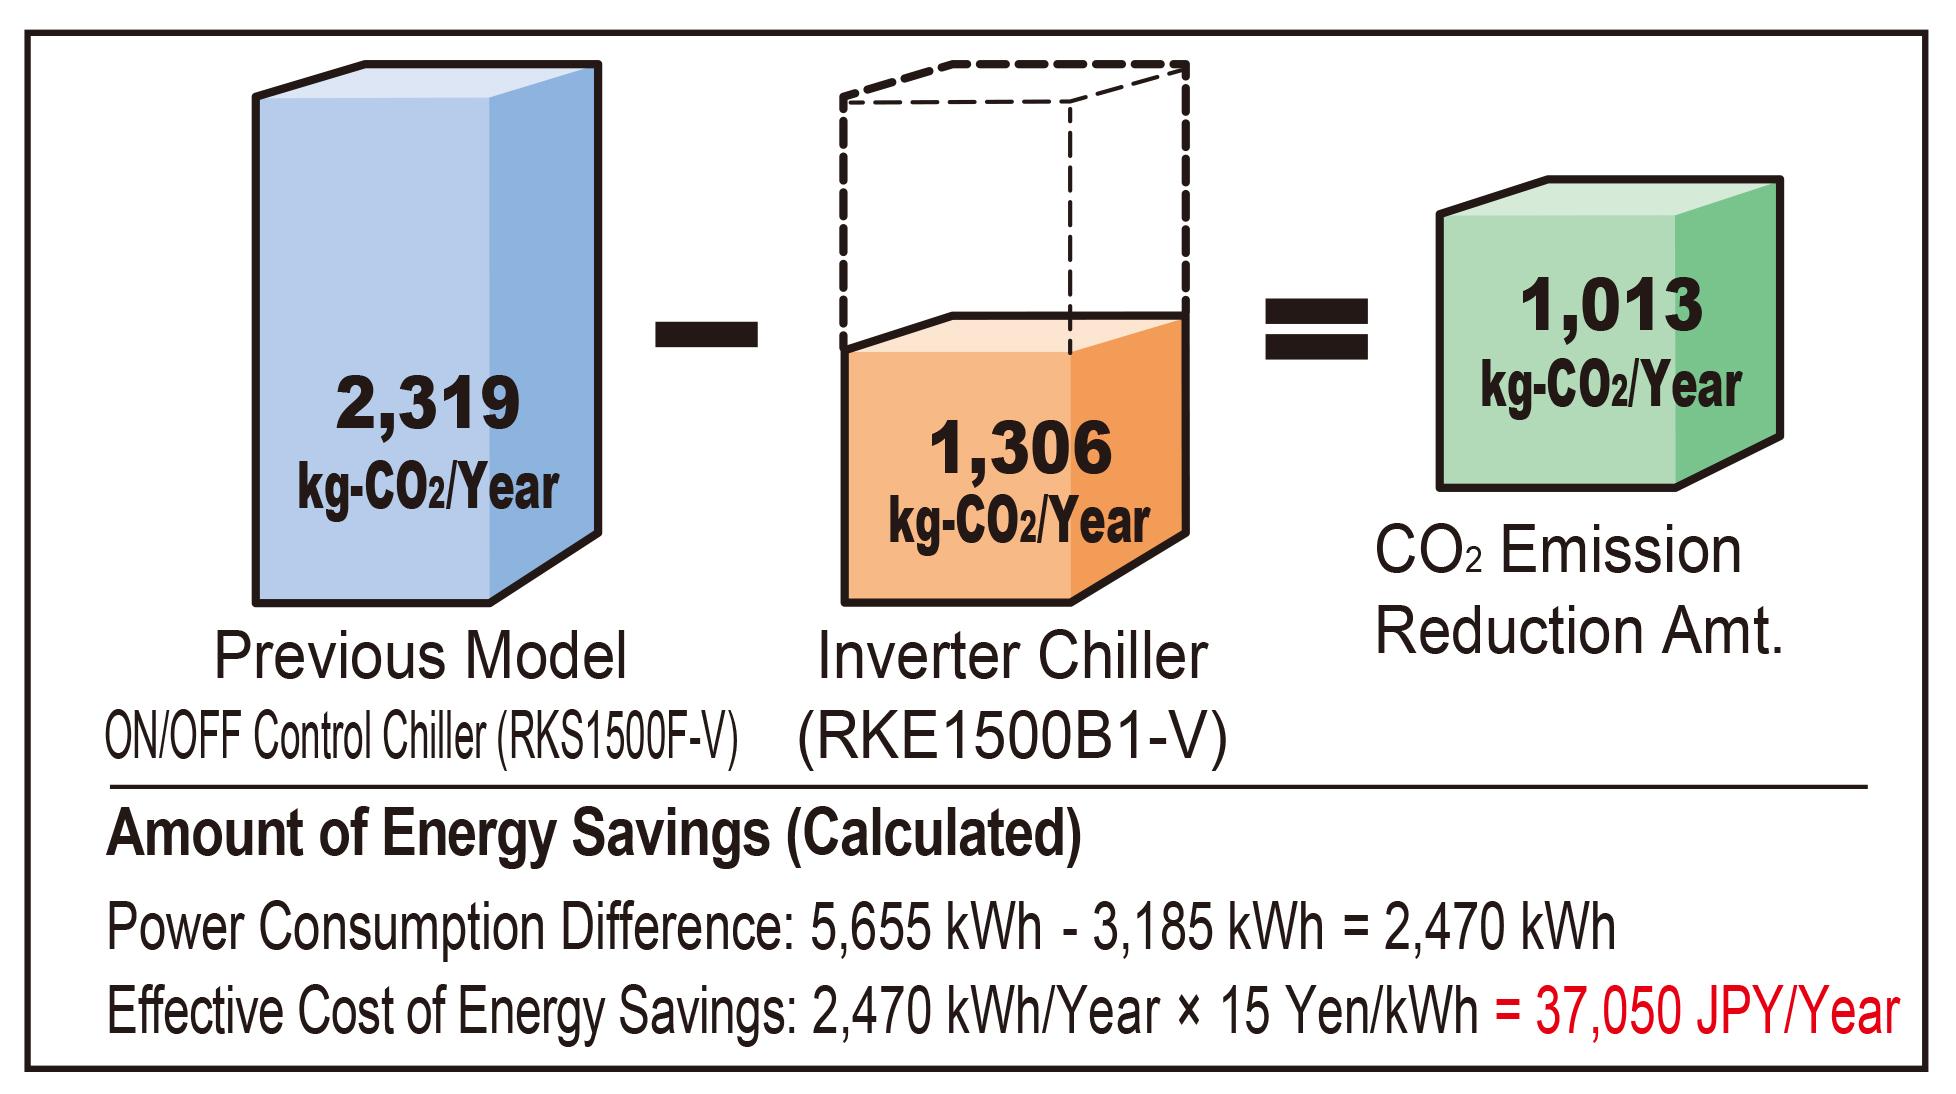 Amount of CO₂ Emission Reduction